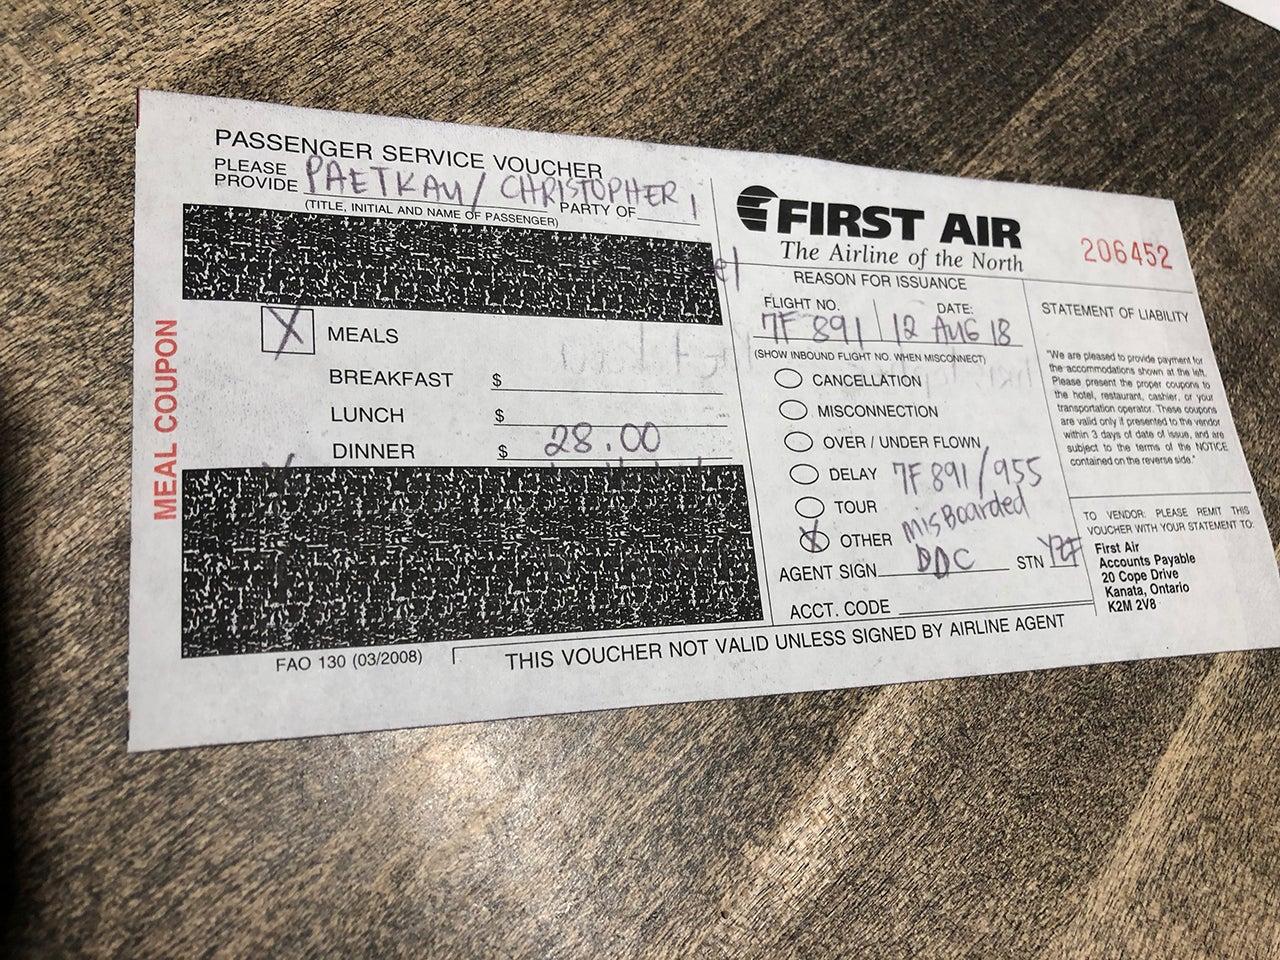 Misunderstanding Sends Man on Flight 1,700 Miles the Wrong Way